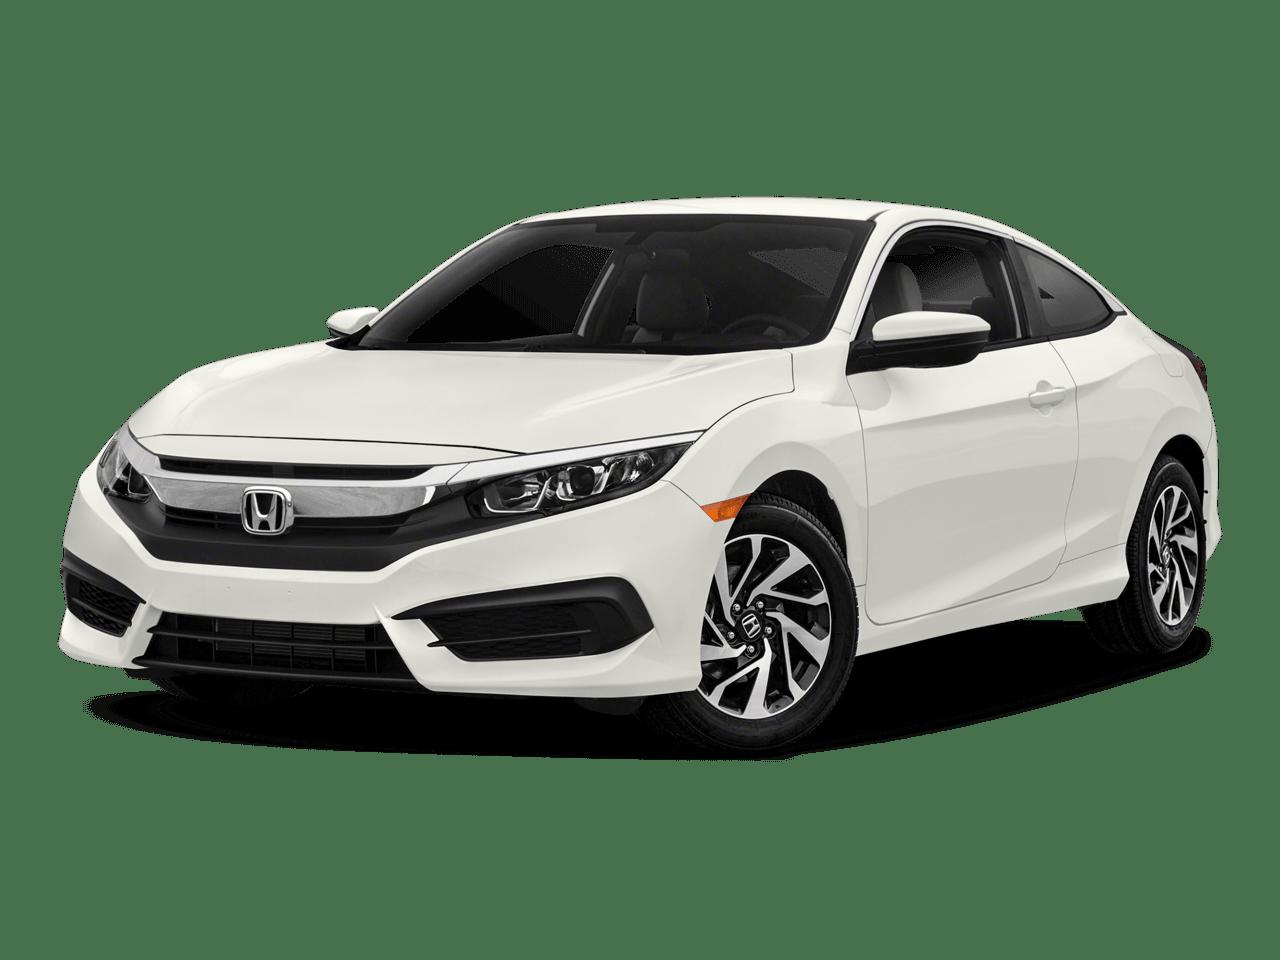 Honda Civic Coupe Rental